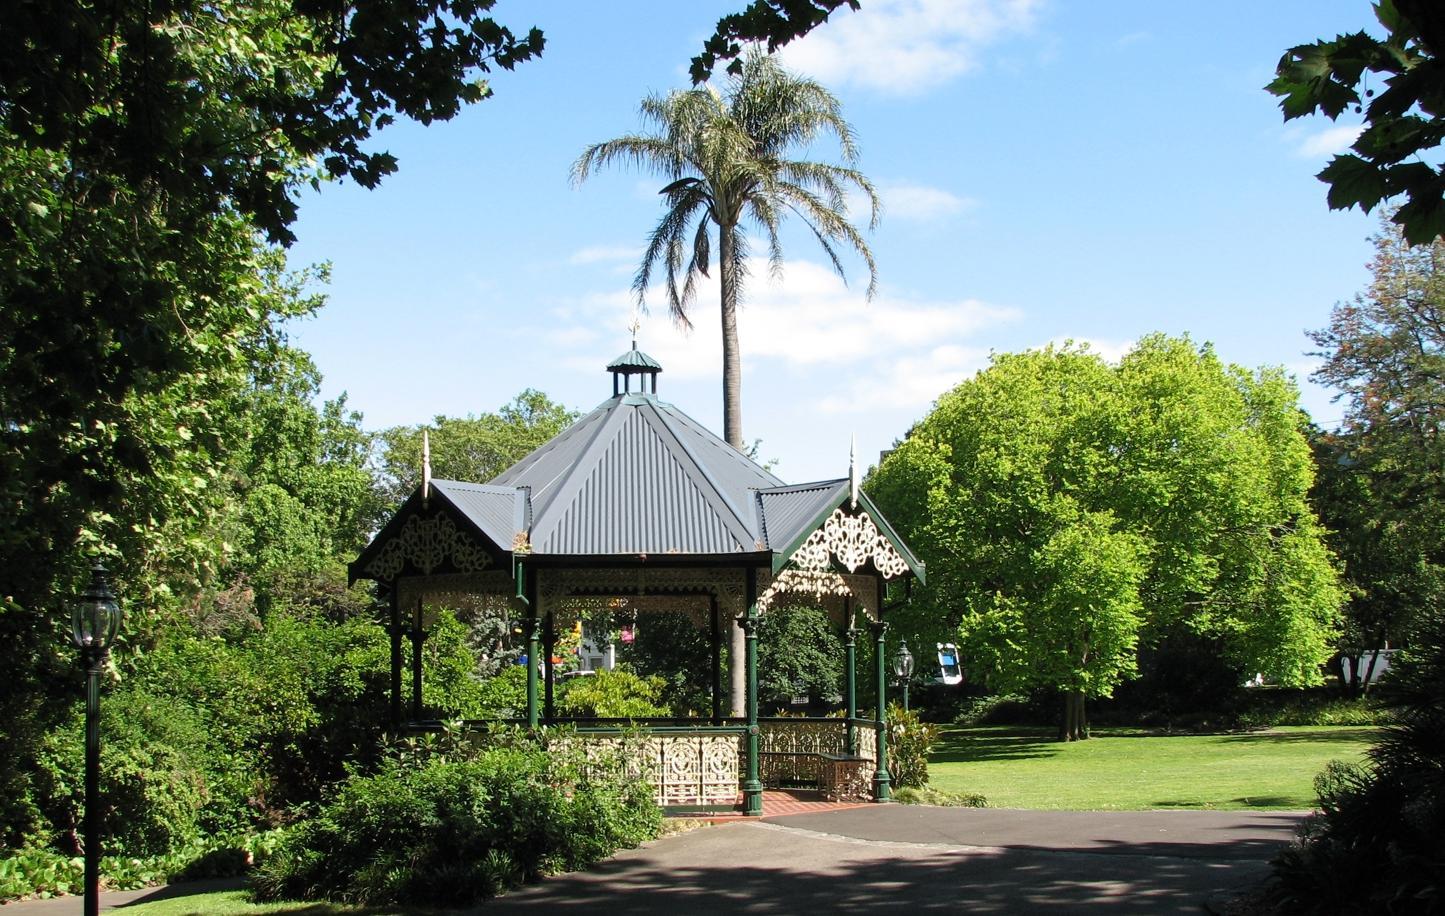 Alexandra Gardens rotunda + wedding ceremony location